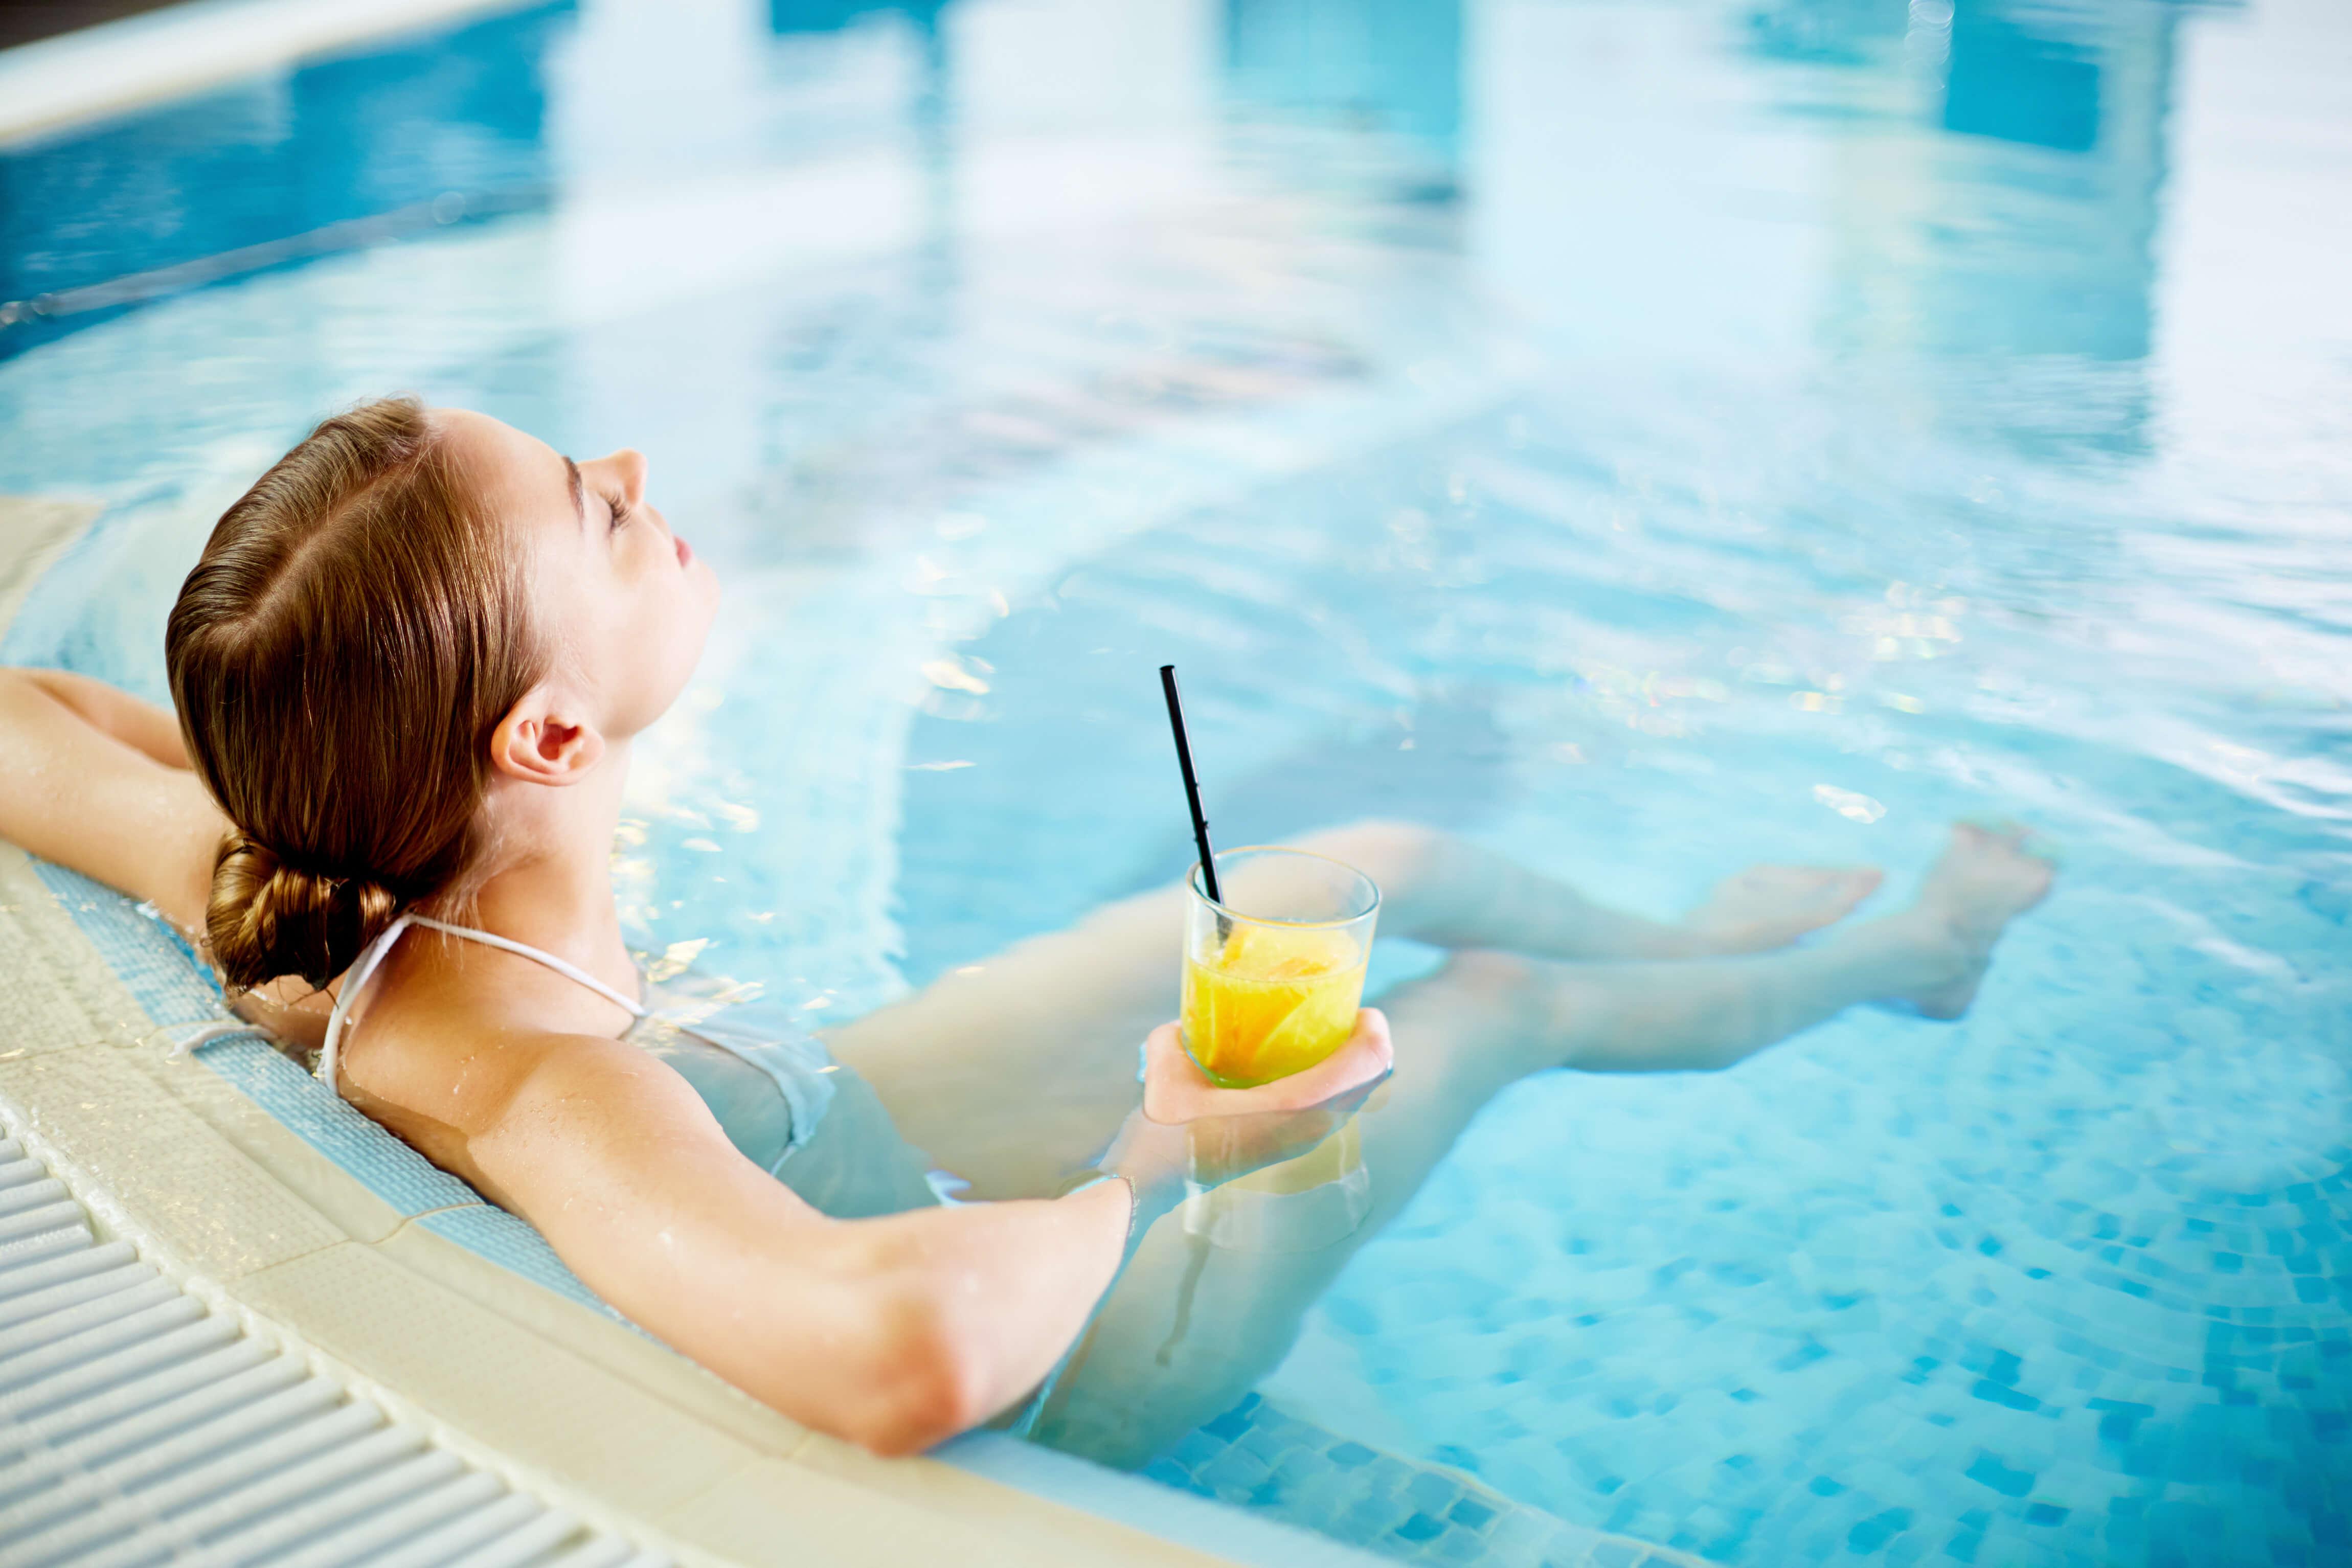 A woman enjoying a relaxing soak in a custom spa, drink in hand.